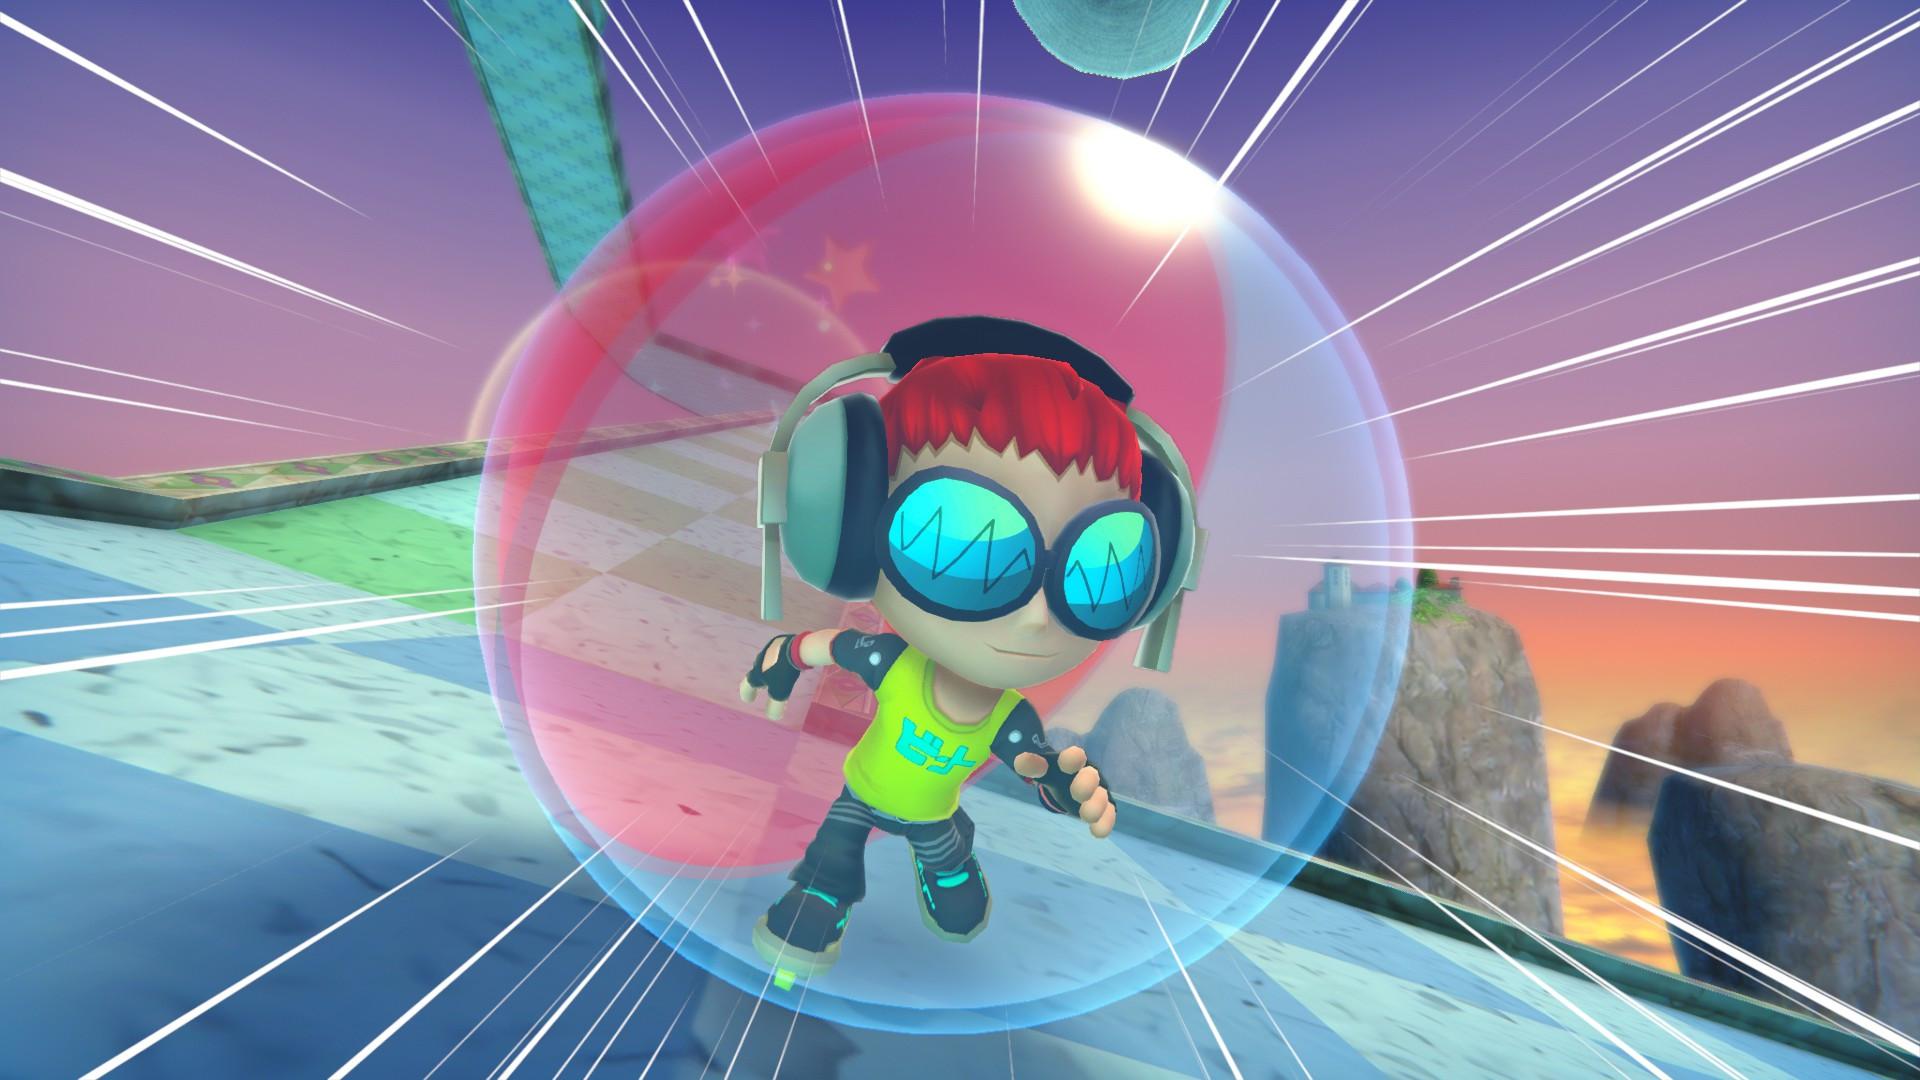 Super Monkey Ball Banana Mania - Game Config Visual Quality Settings - • The Modding Scene [WIP] - CB2A8FB